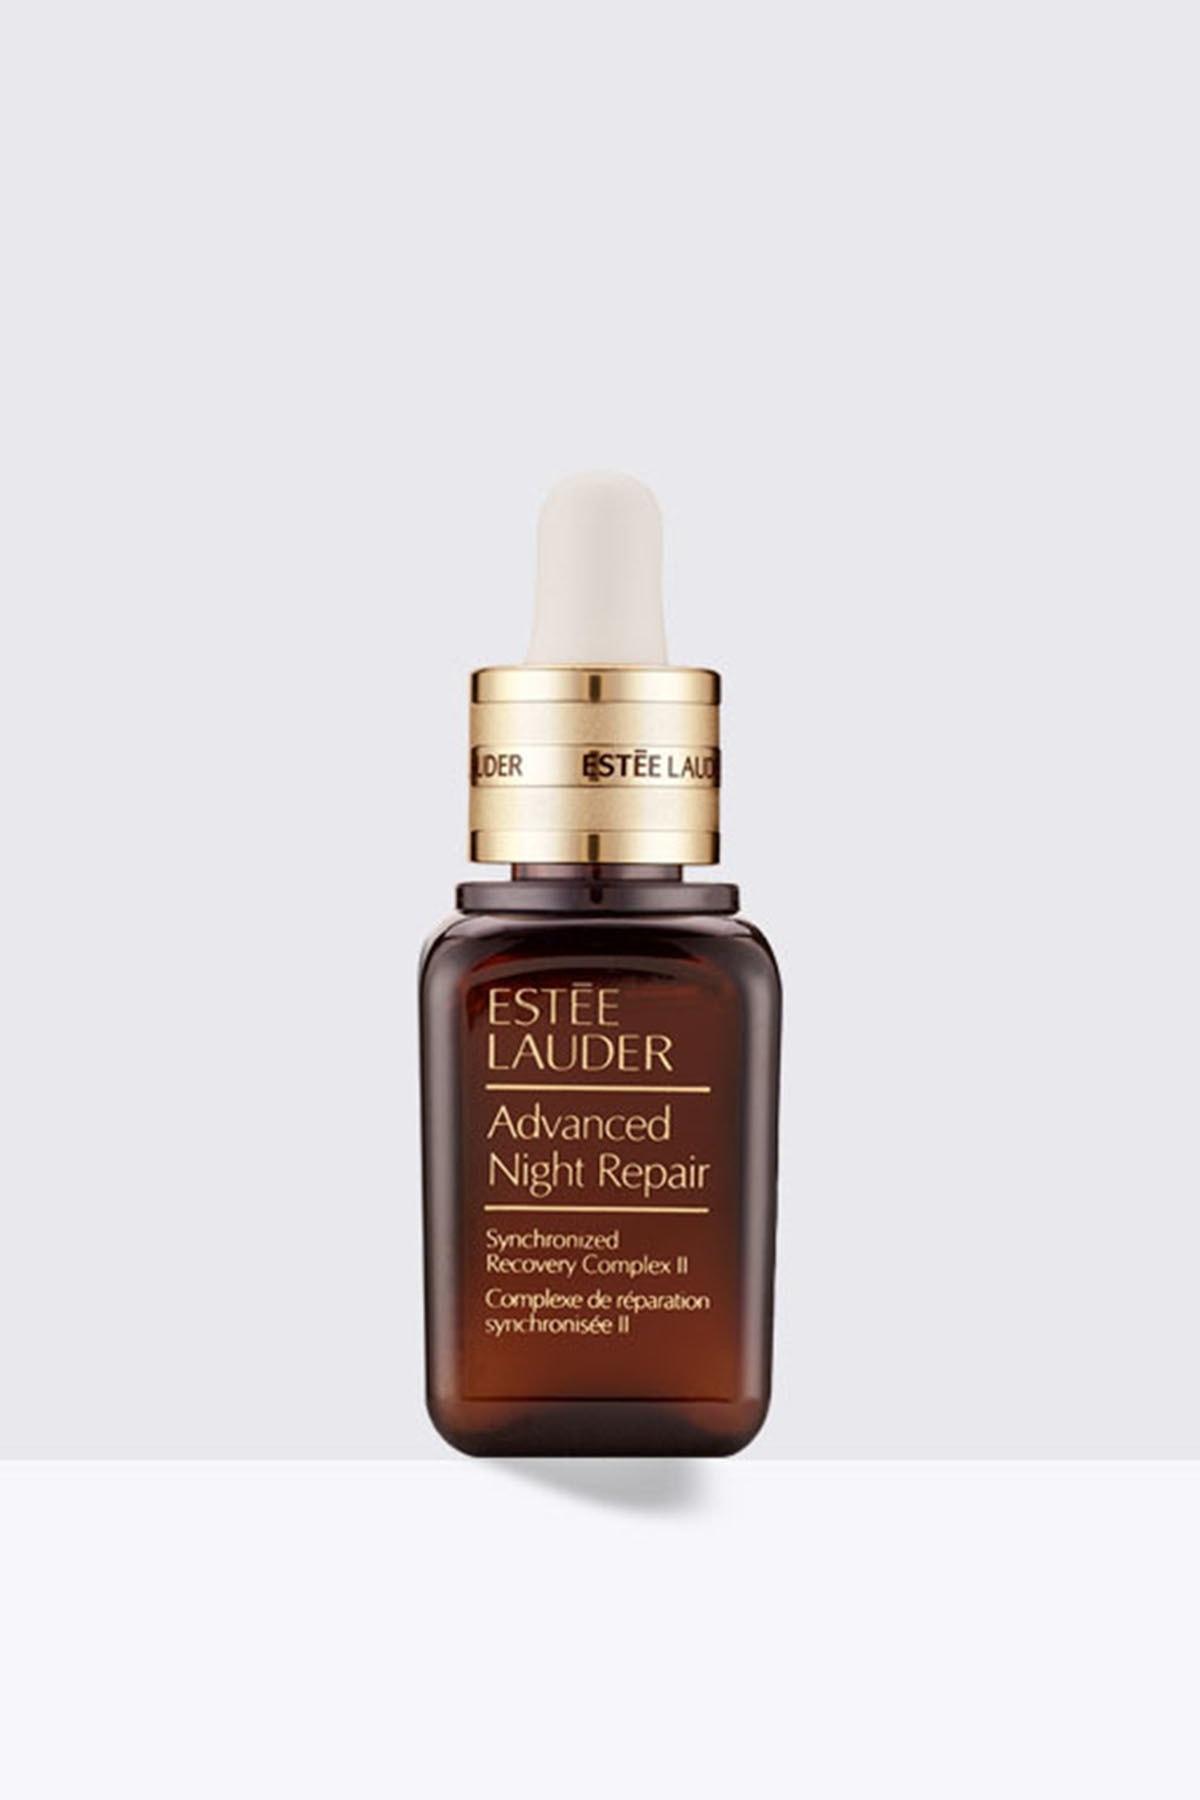 Estee Lauder Yaşlanma Karşıtı Gece Serumu - Advanced Night Repair 20 Ml- 50 Ml - 75 Ml